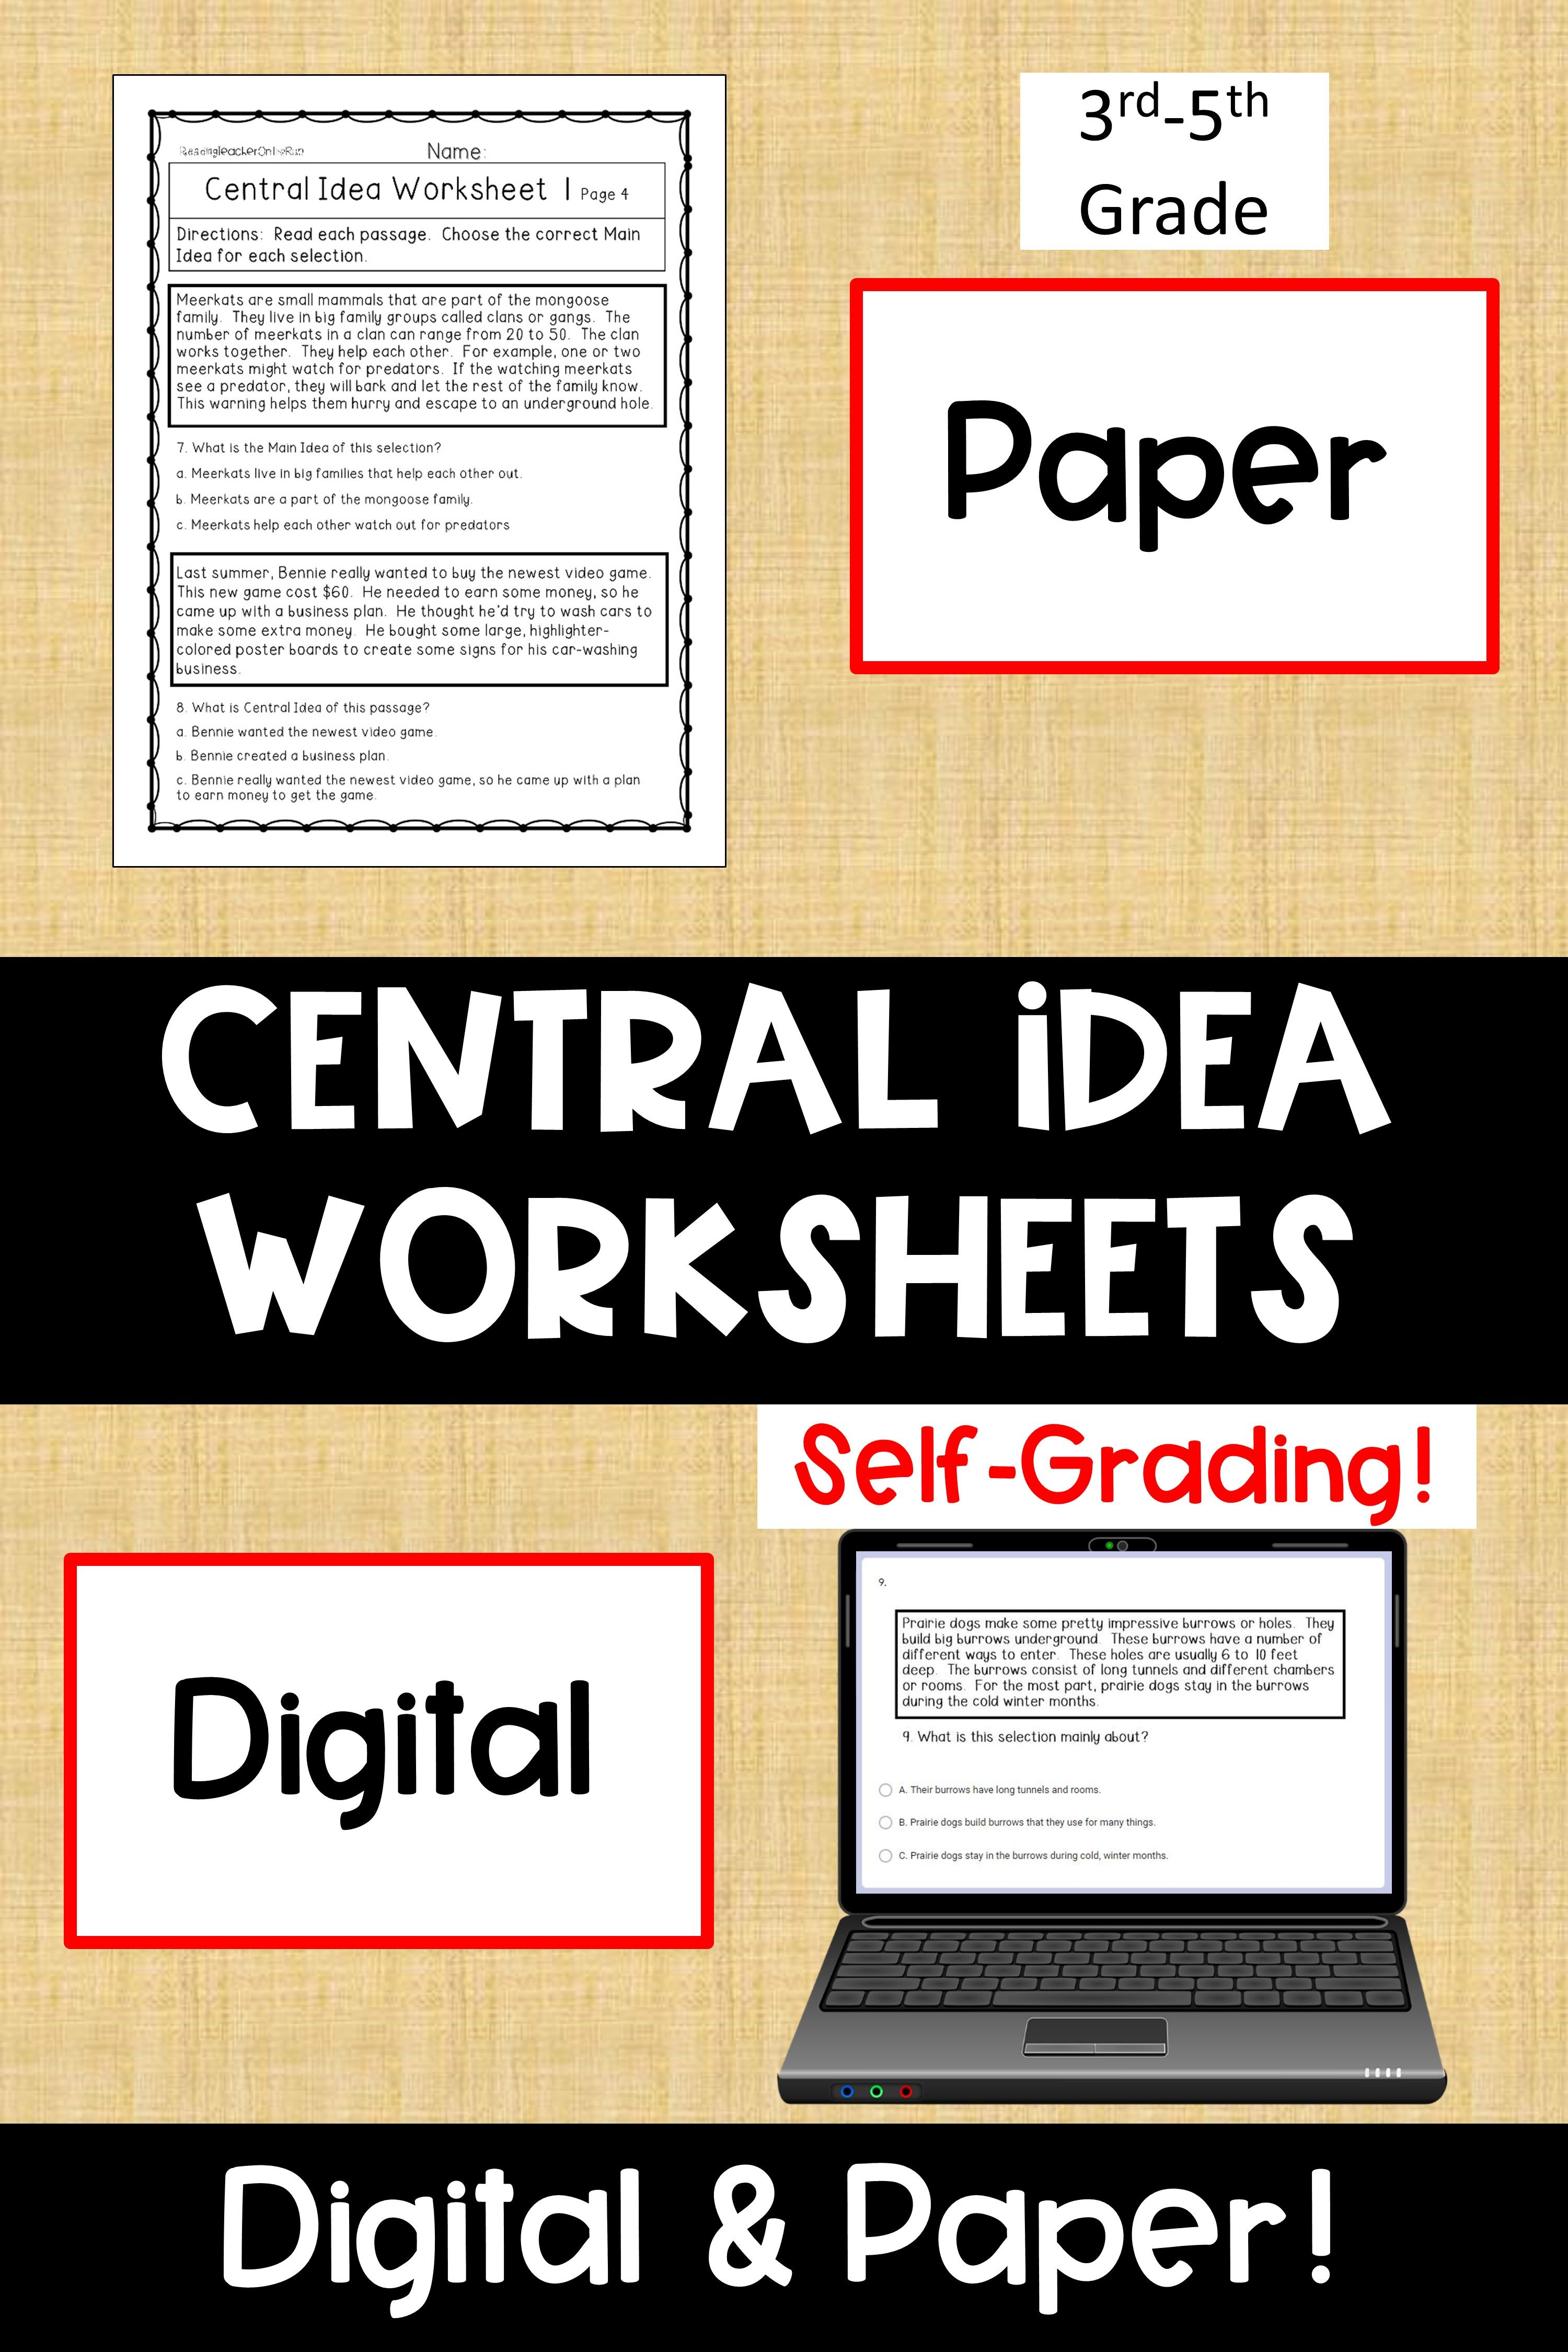 Central Idea Worksheets Digital Print Main Idea Worksheet Teacher Tools Printable Worksheets [ 4500 x 3000 Pixel ]